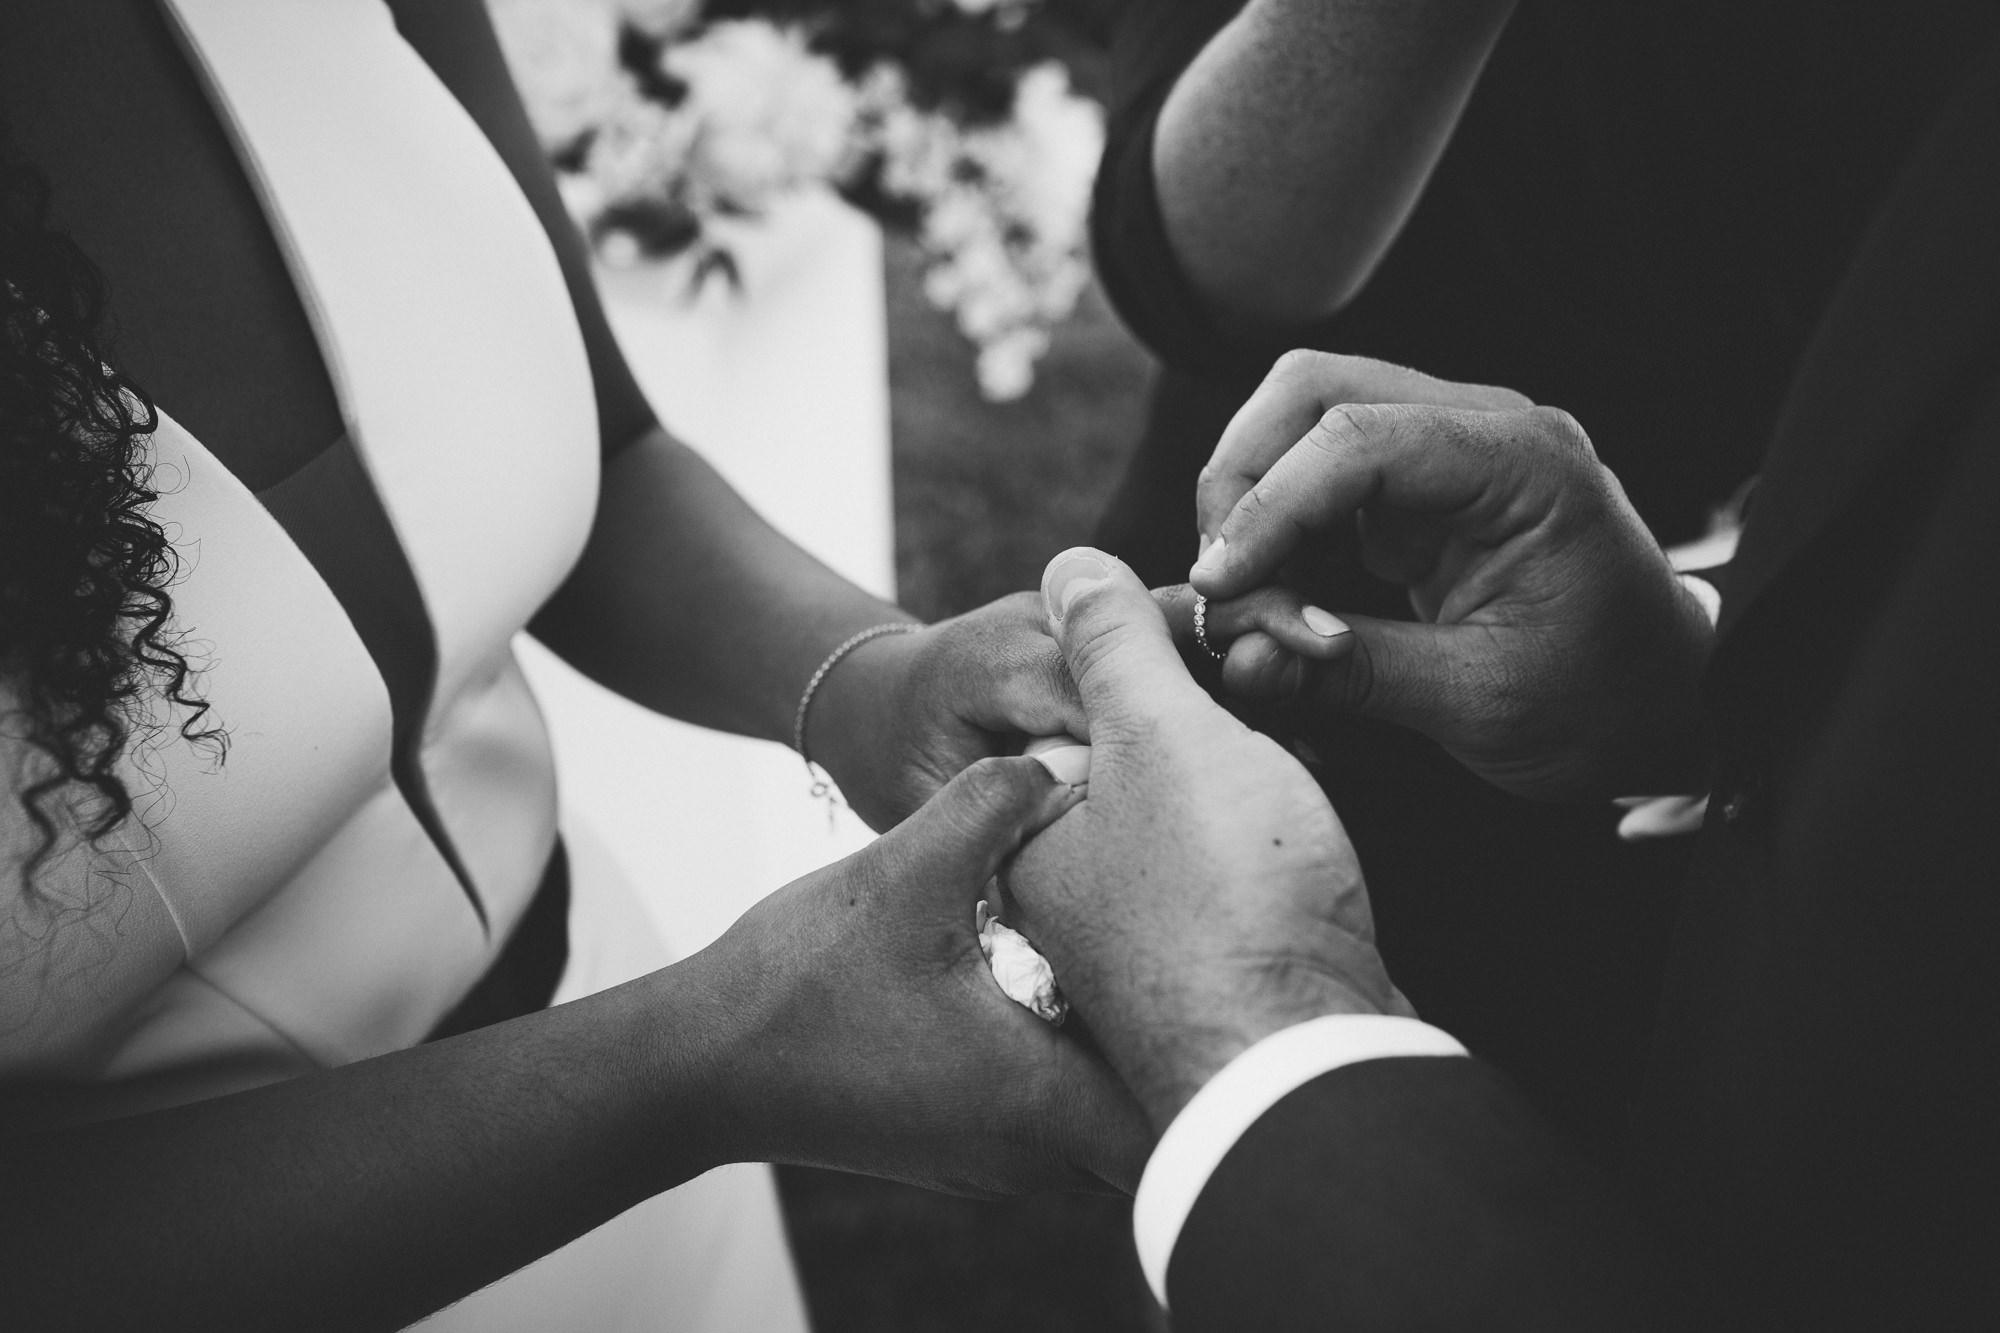 stratus-winery-wedding-vineyard-wedding-vineyard-bride-photo-by-reed-photography-043.jpg